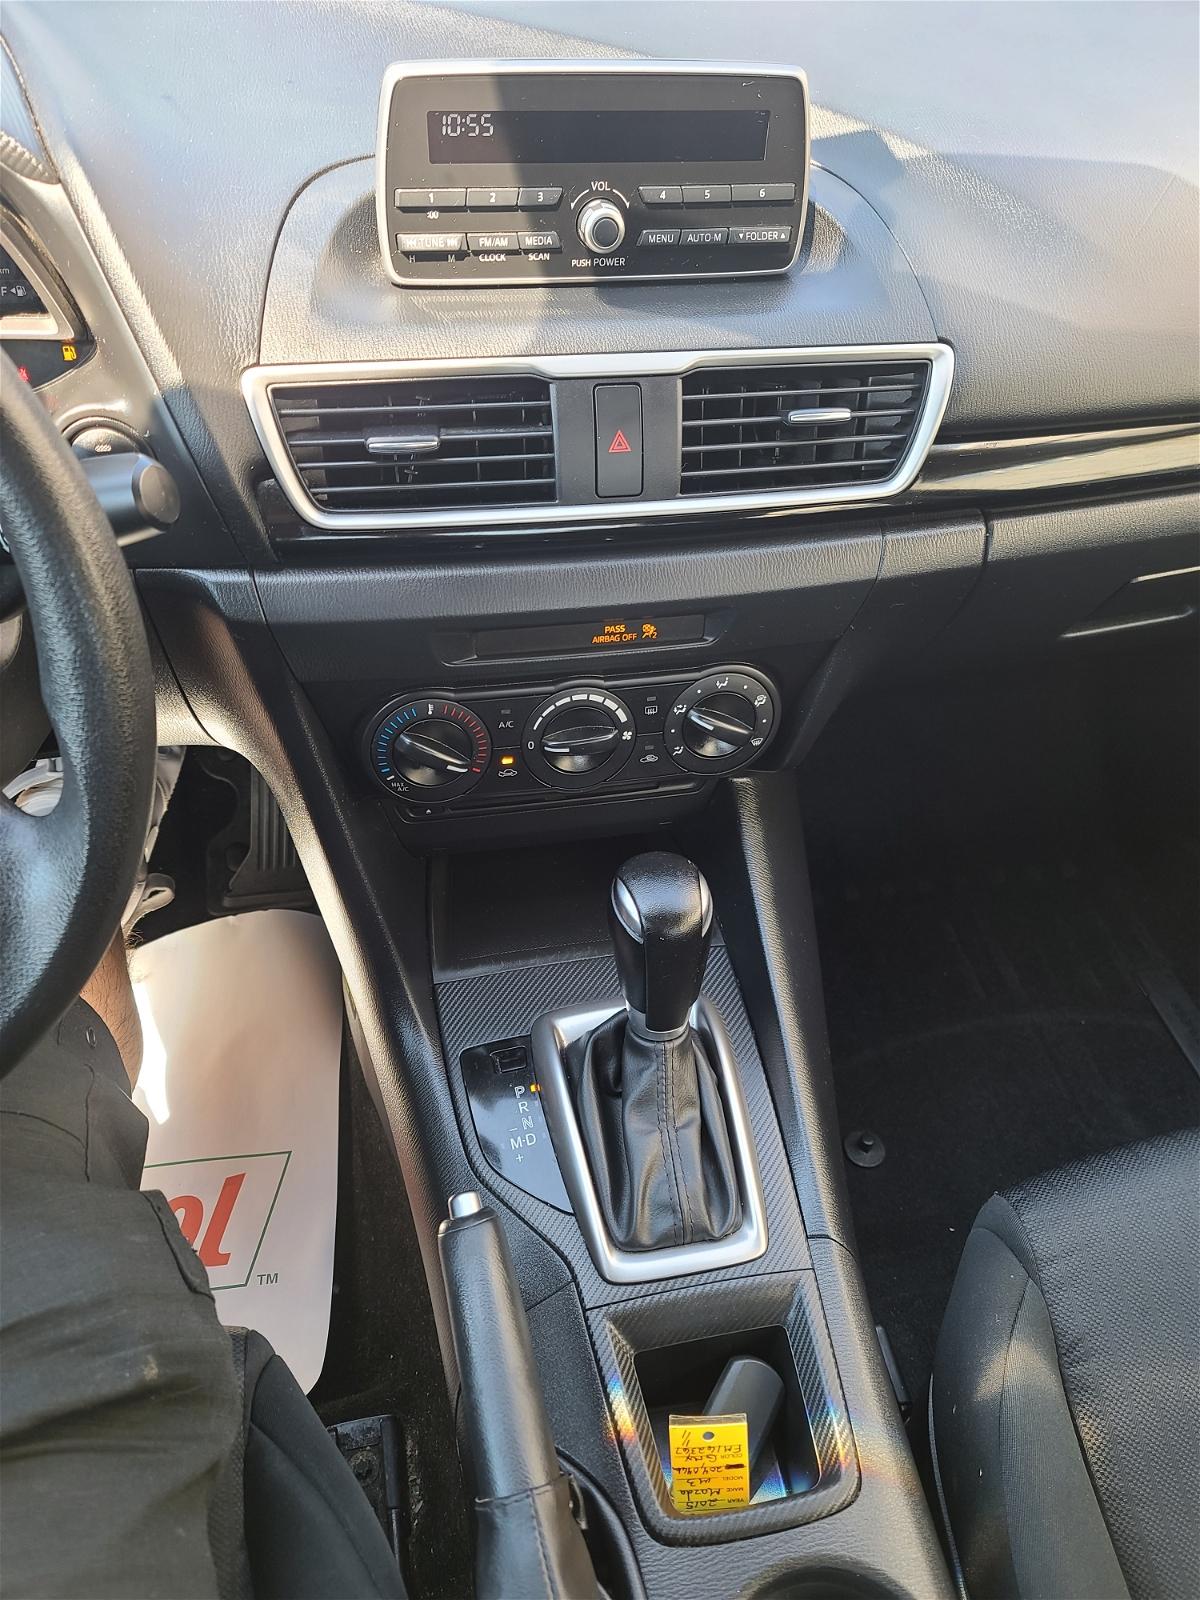 2015 - Mazda - MAZDA3 - 3MZBM1U70FM162367